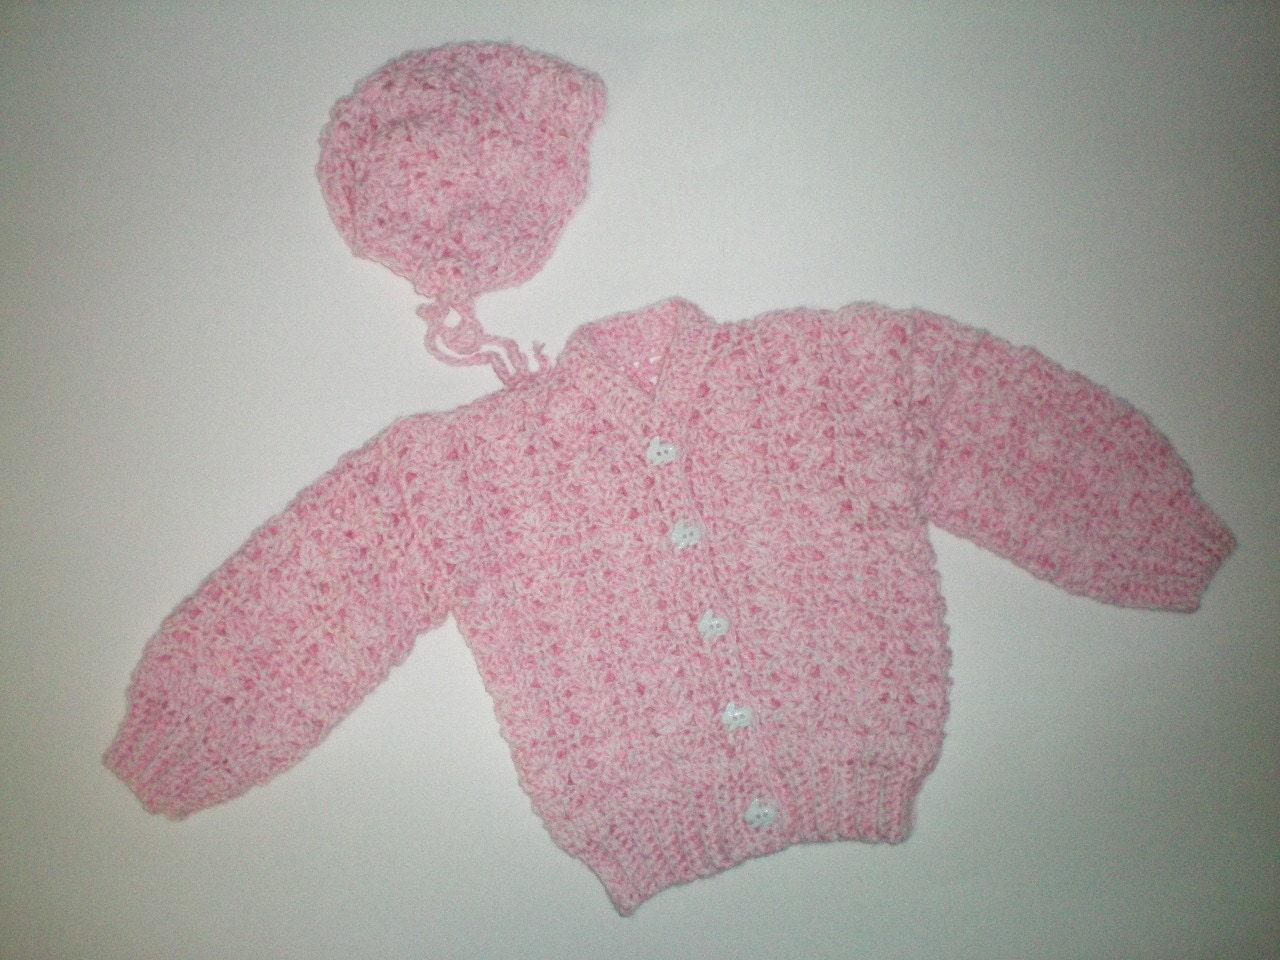 Shell Stitch Crochet Sweater with Hat Item CBJ601